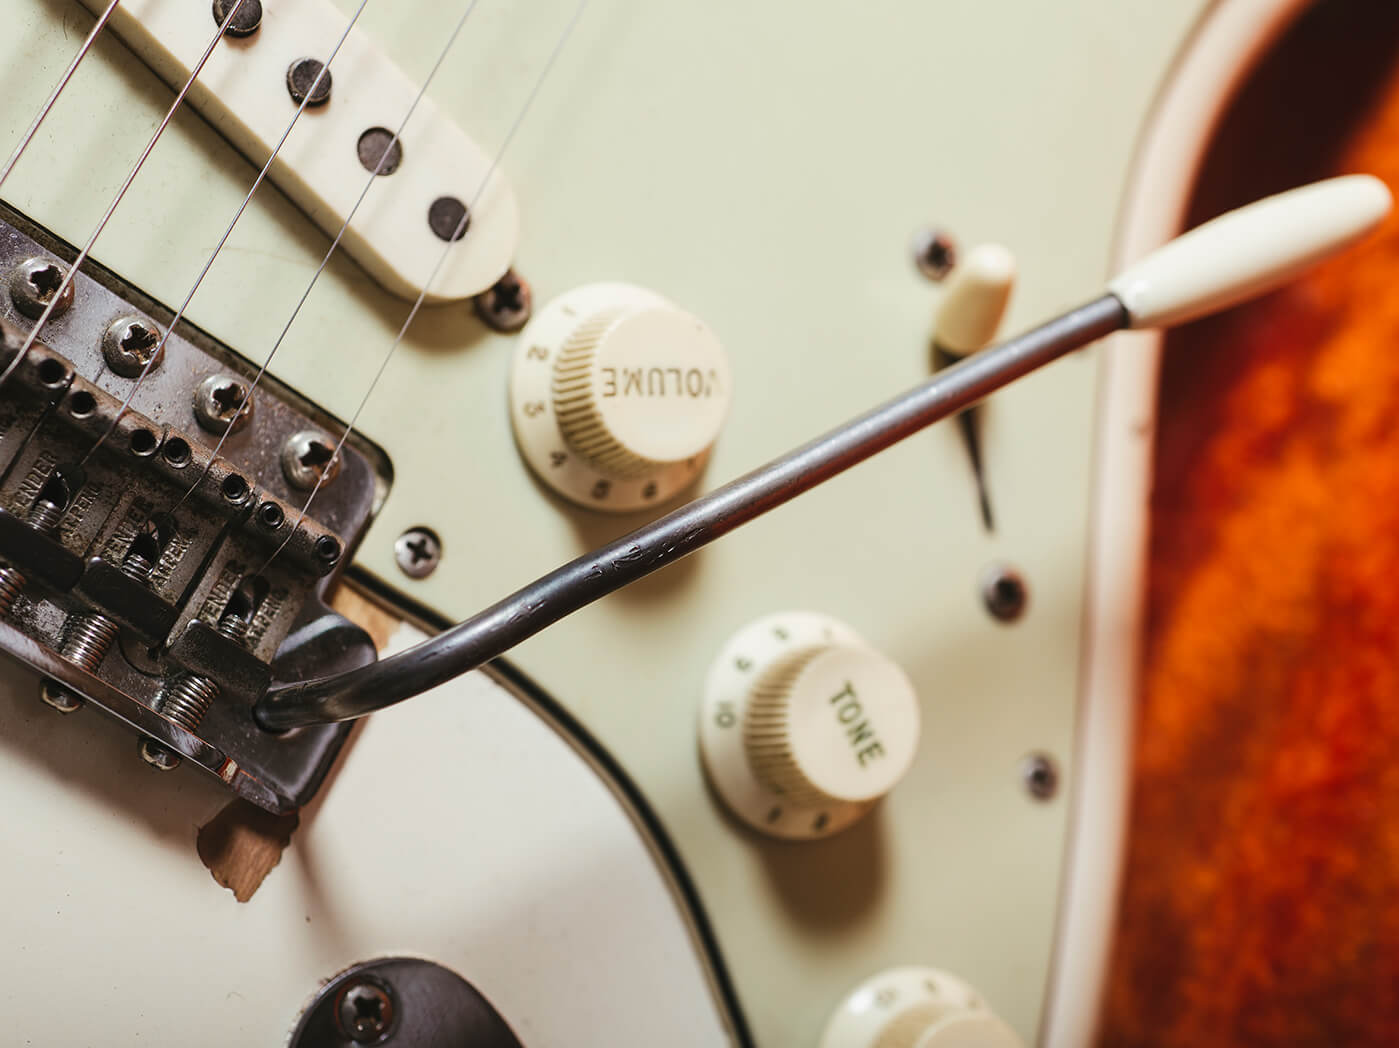 Fender Jimi Hendrix 63 tremolo